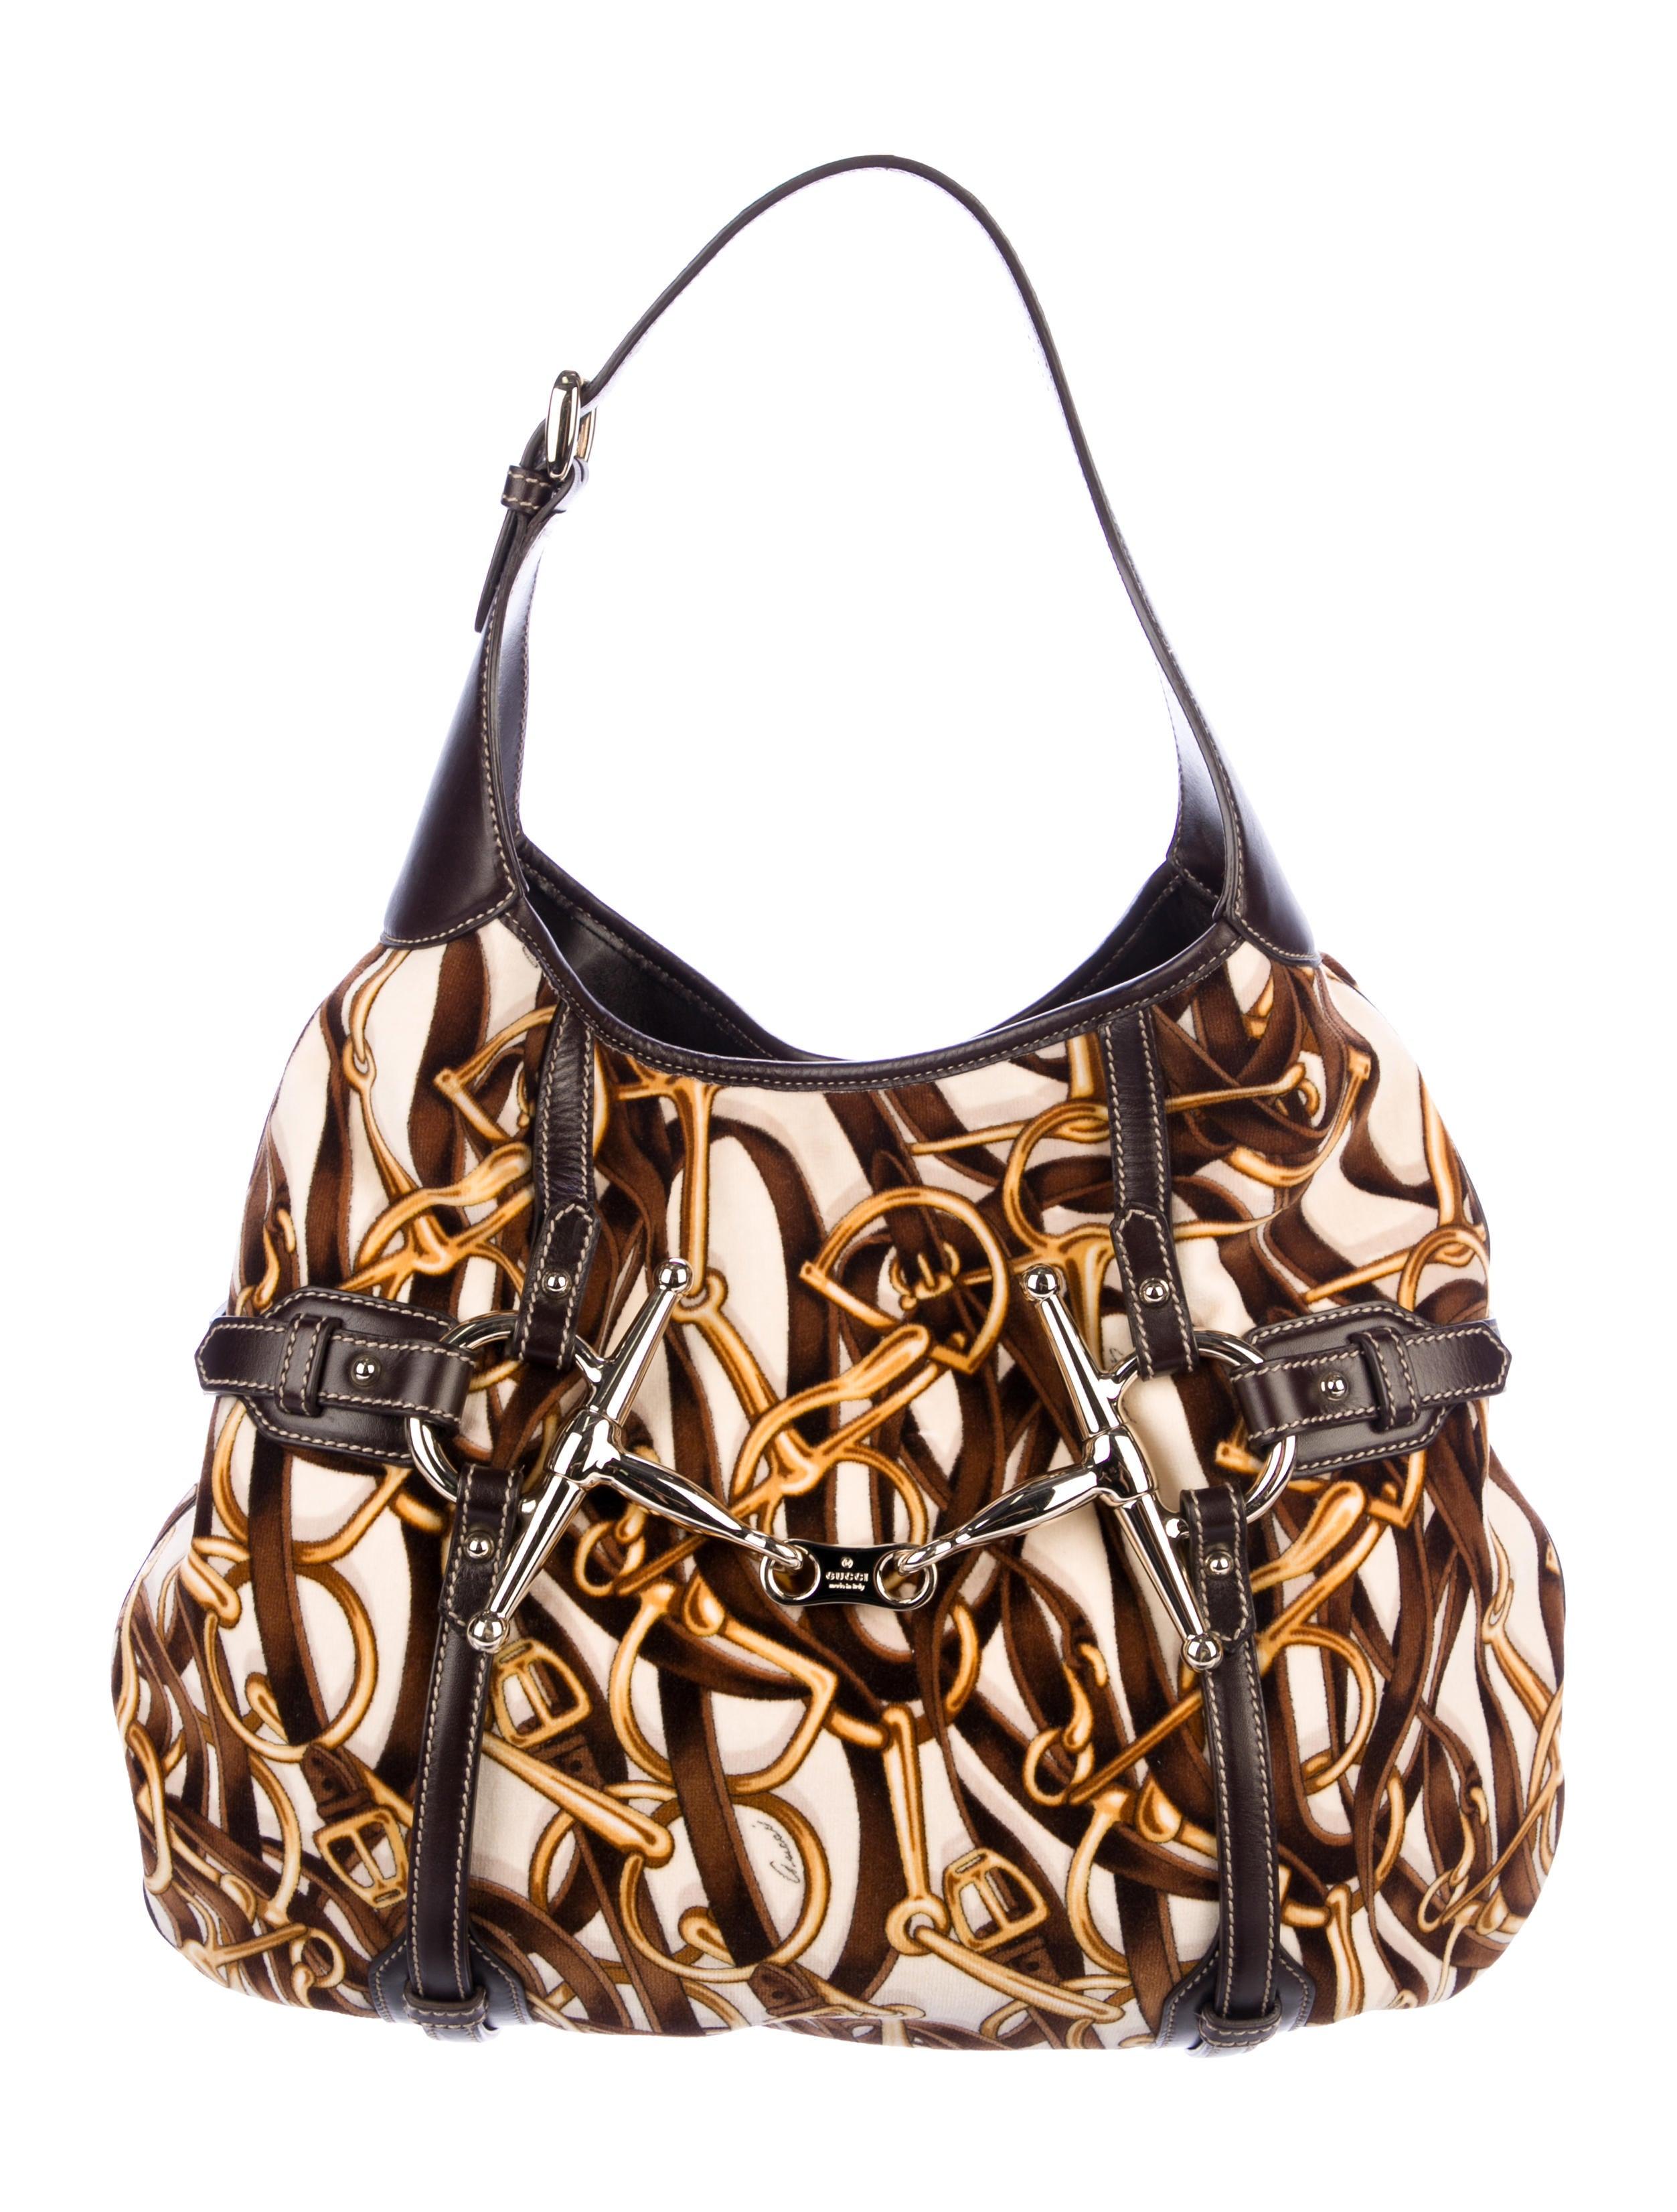 870799dd36bb Gucci 85th Anniversary Horsebit Hobo - Handbags - GUC237968 | The ...